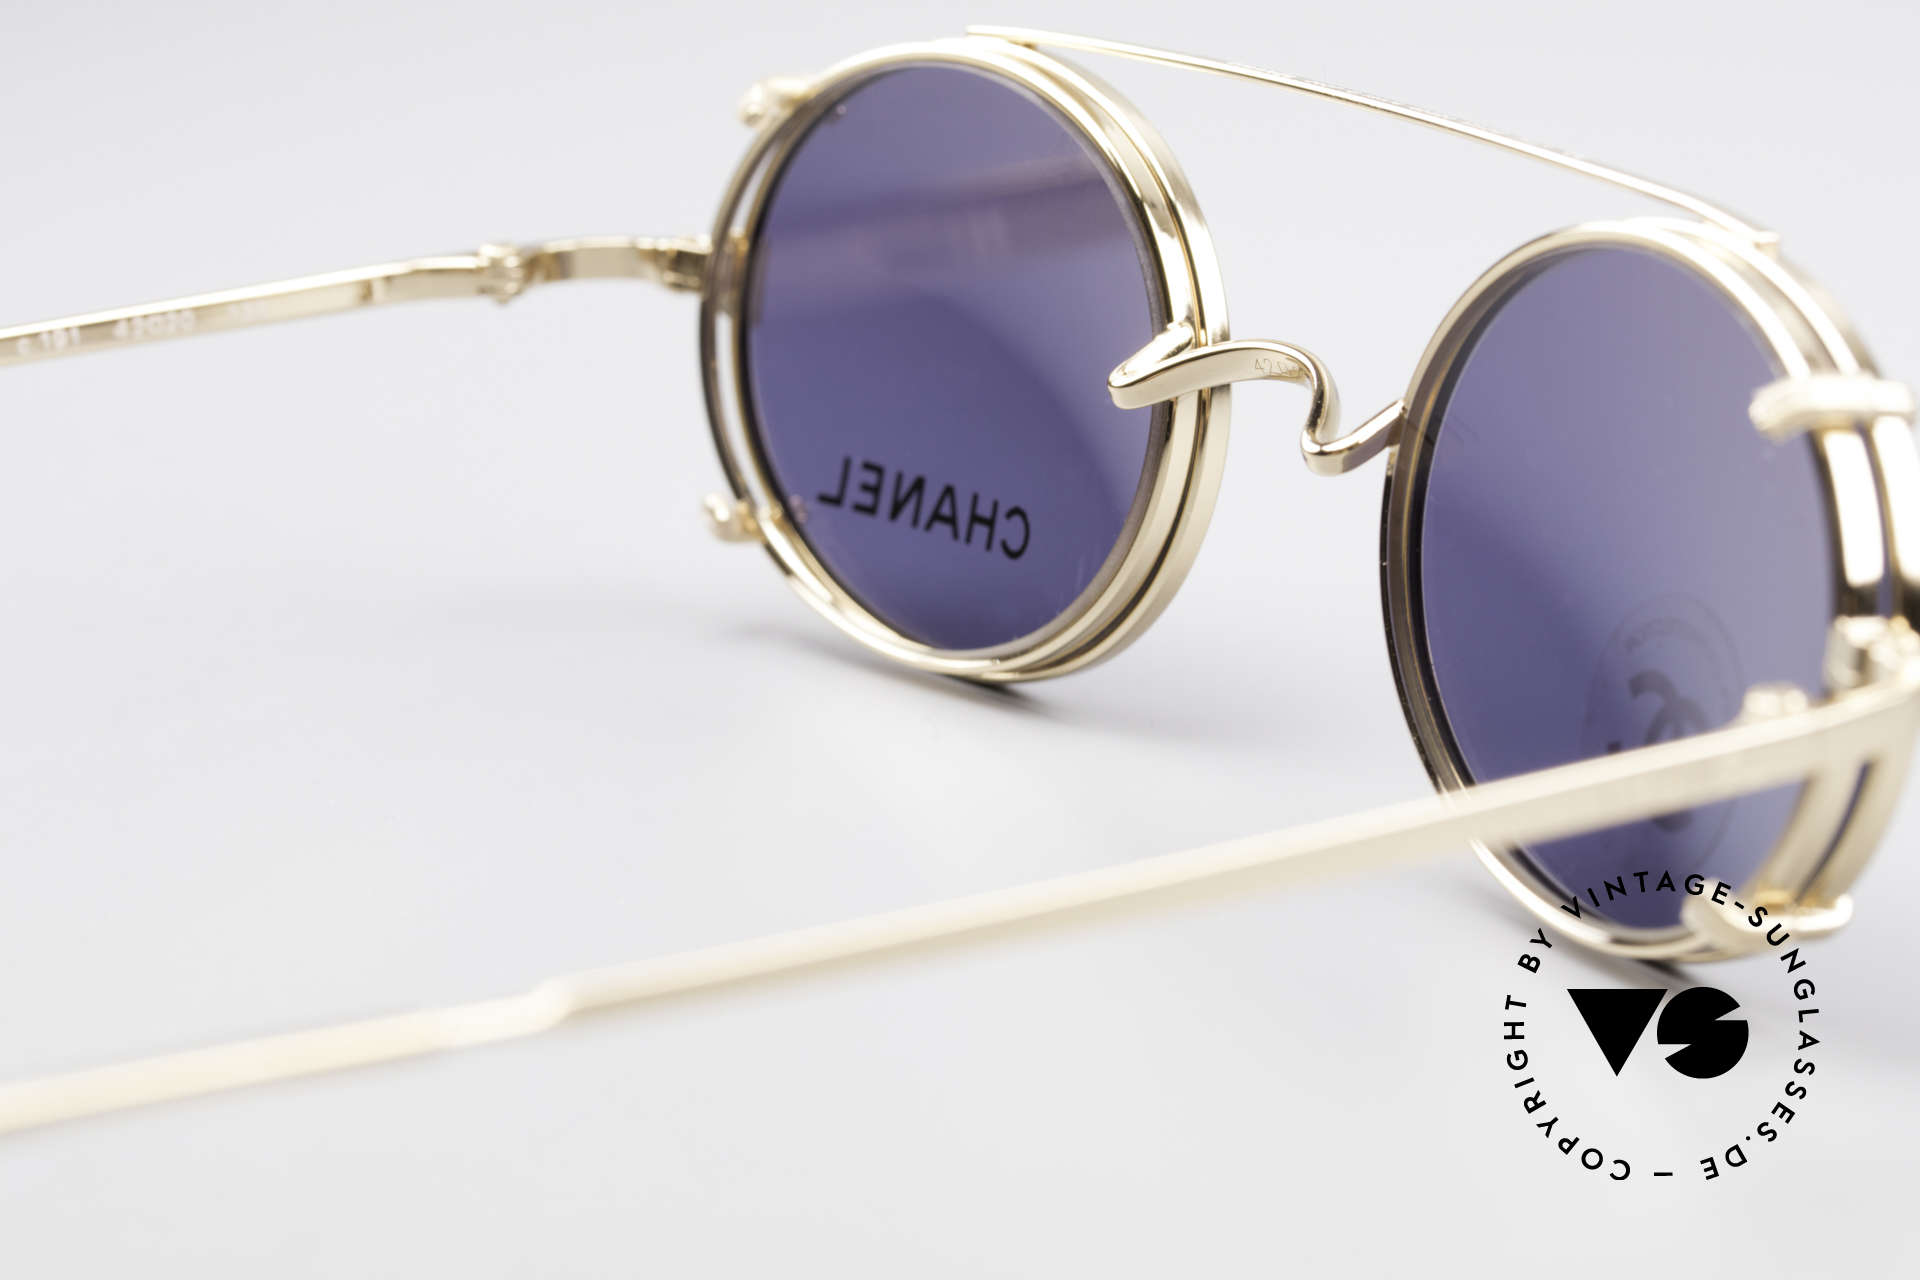 57164322b0 Sunglasses Chanel 2037 Small Luxury Glasses Clip On | Vintage Sunglasses